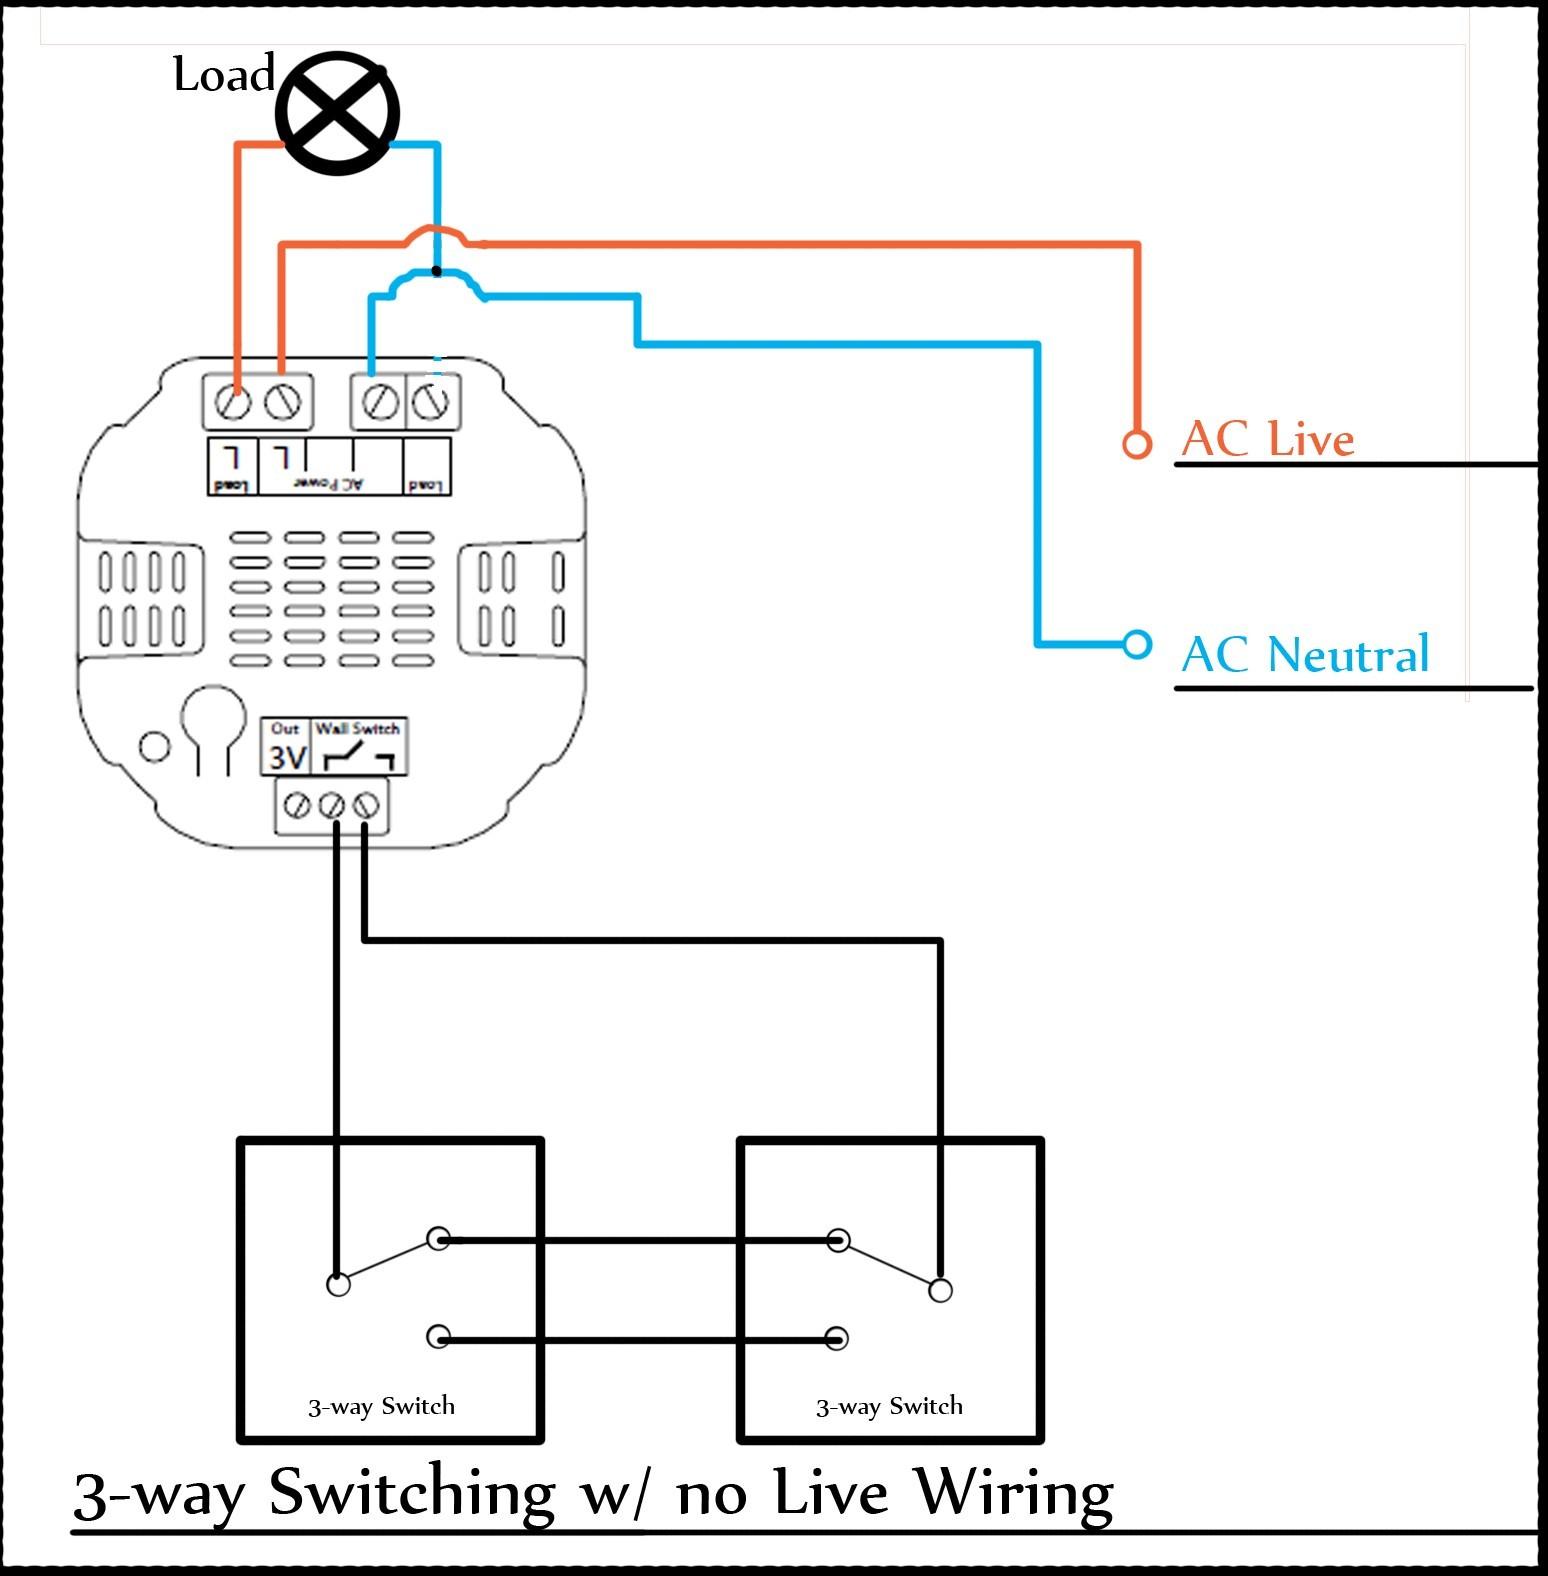 Wiring Diagram Gallery: 3 Way Switch Wiring Diagram Pdf